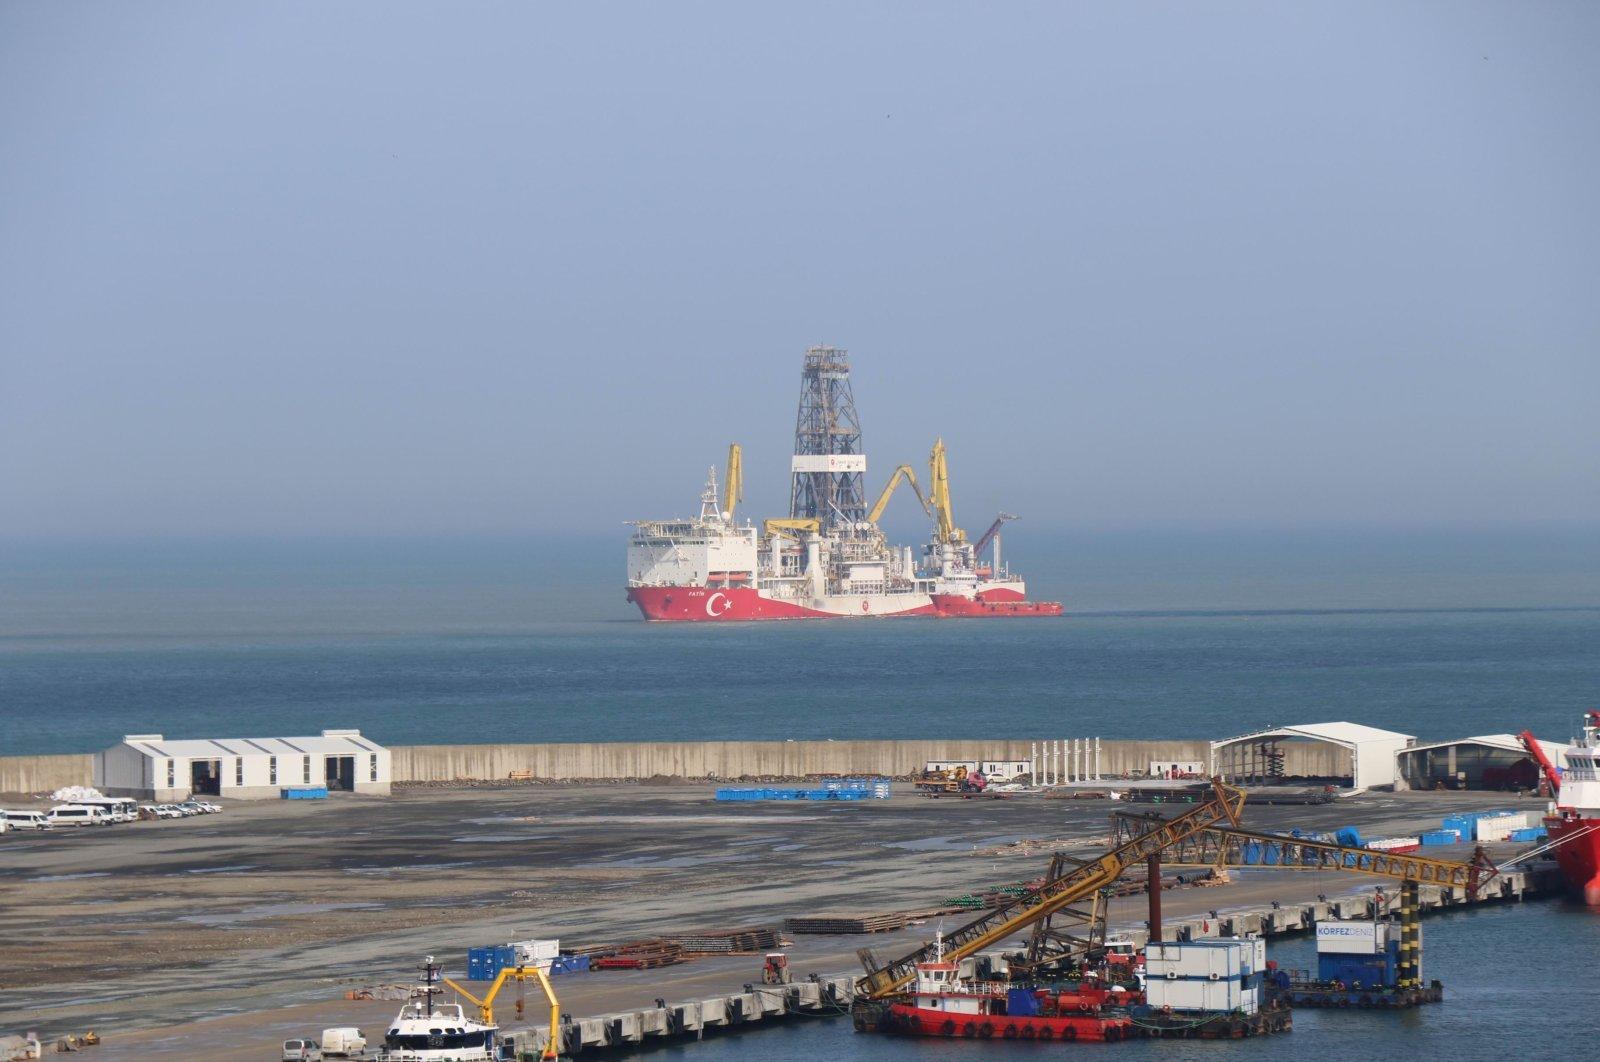 Turkey's first drillship Fatih off the Port of Filyos in Zonguldak, northern Turkey, April 6, 2021. (IHA Photo)